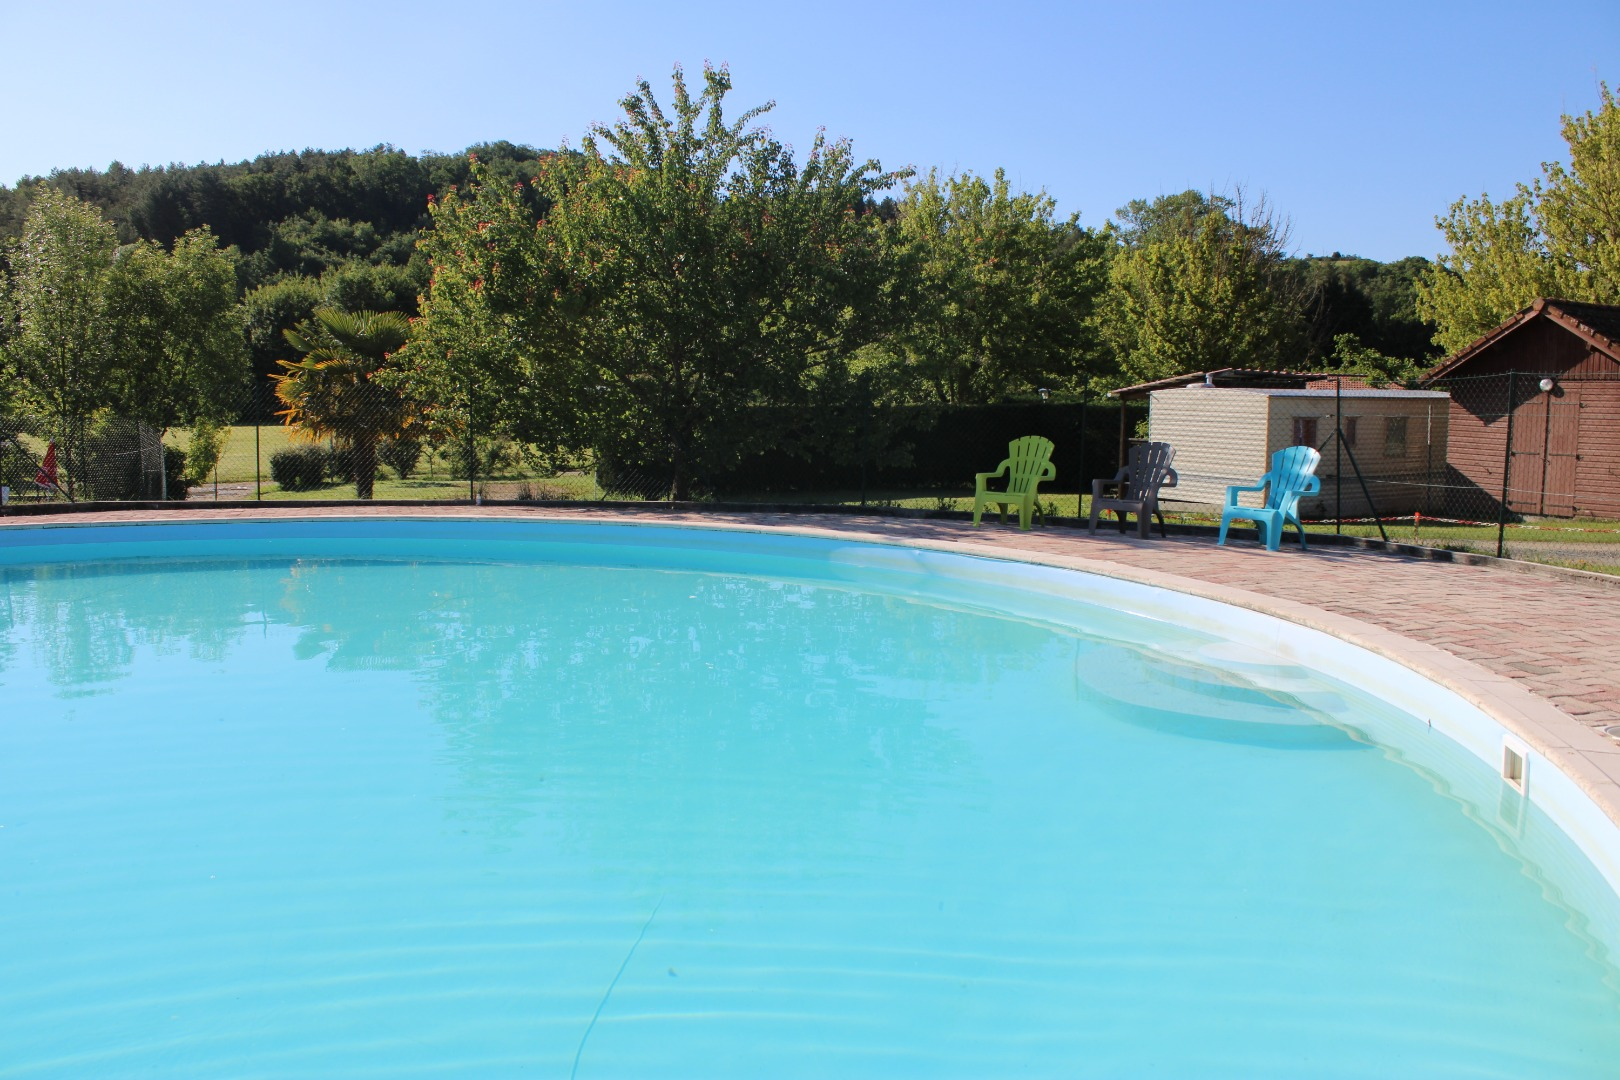 Camping avec grande piscine à Casties-Labrande